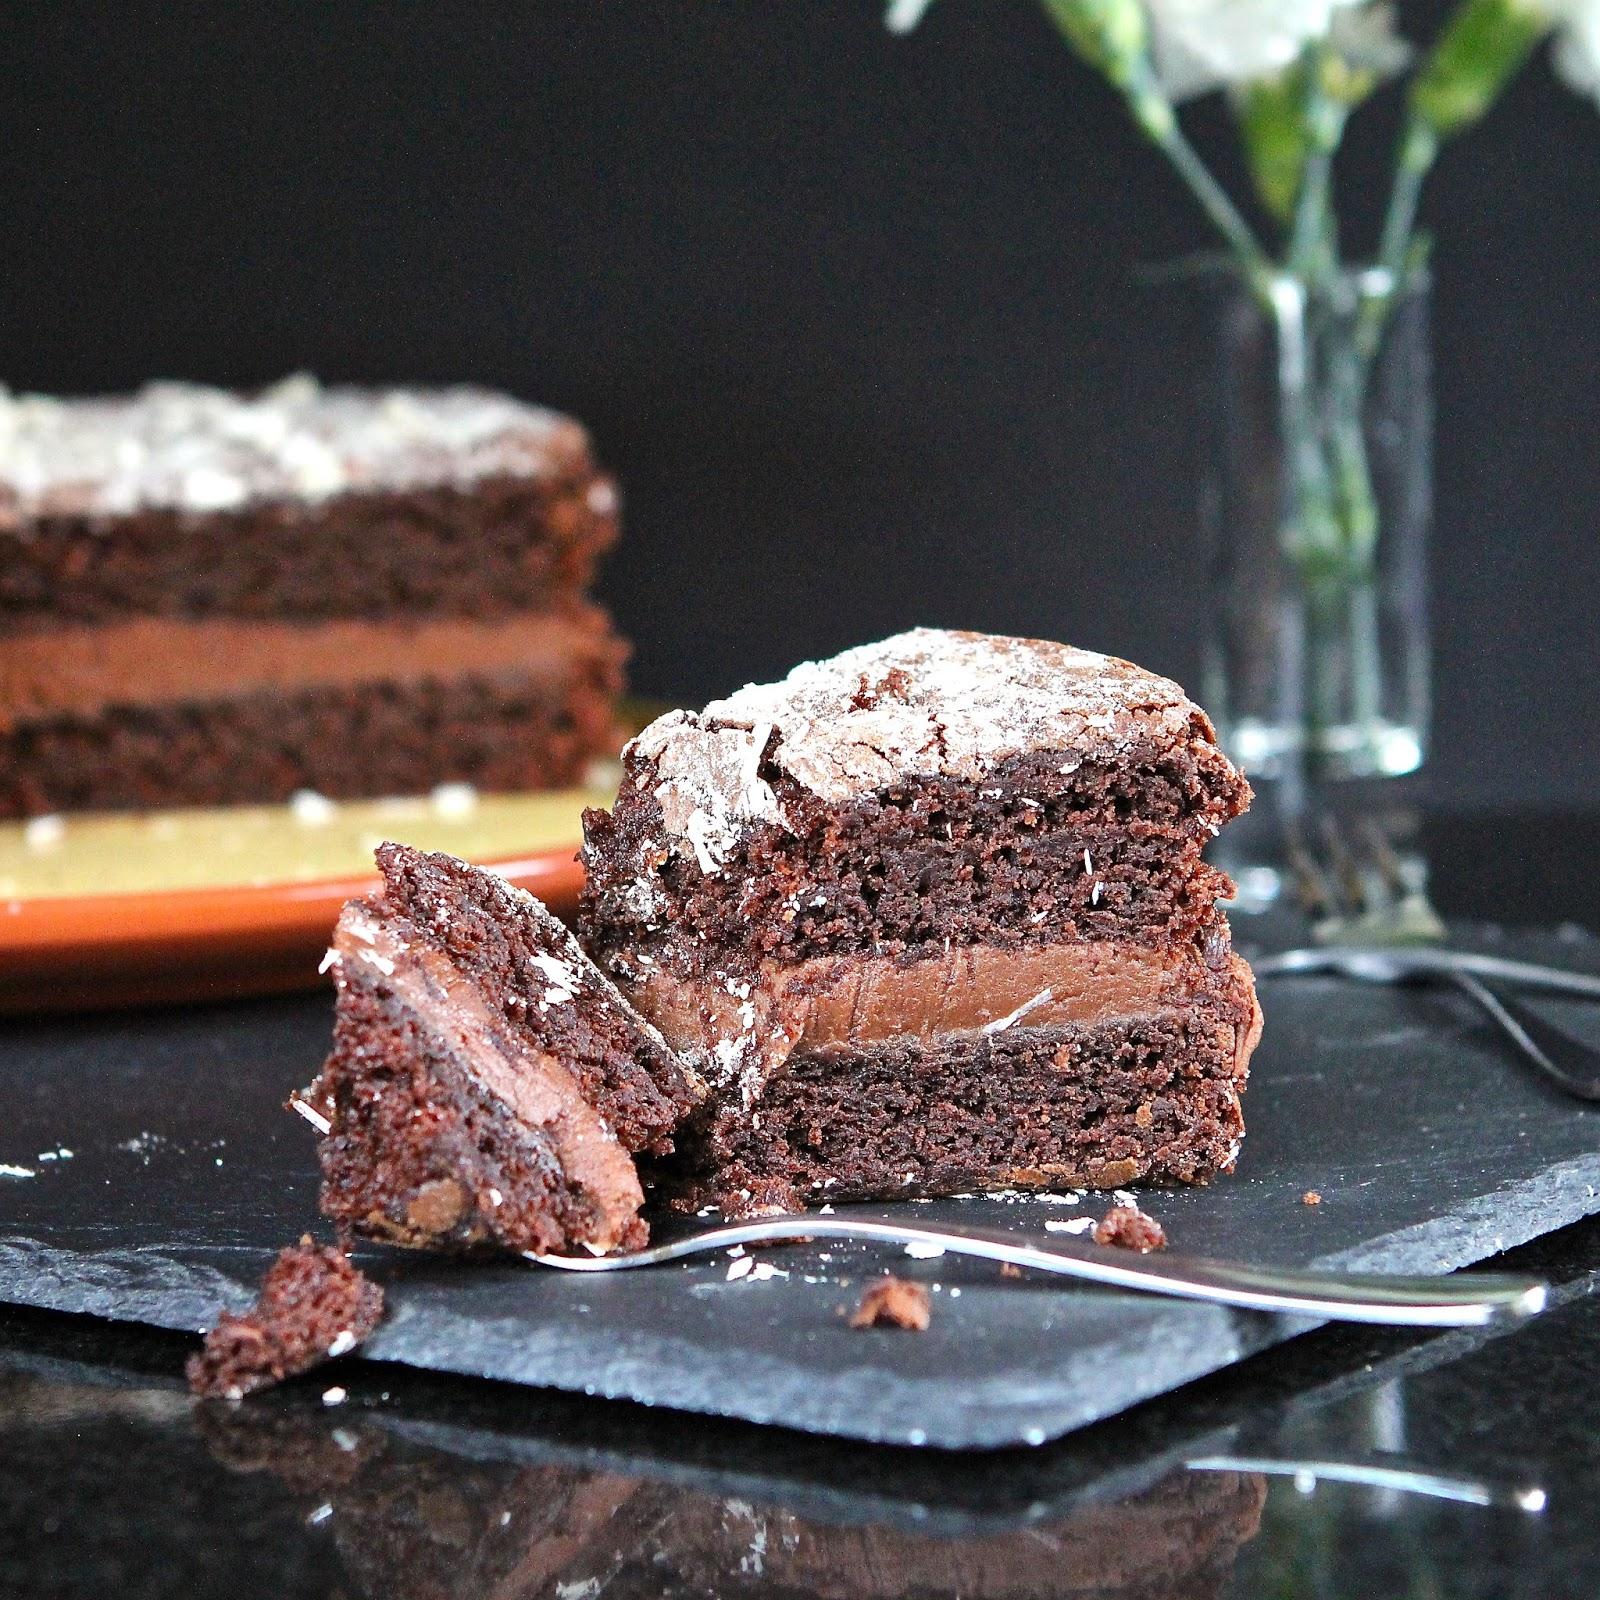 Chef Vikkis Secret Ingredient Chocolate Cake